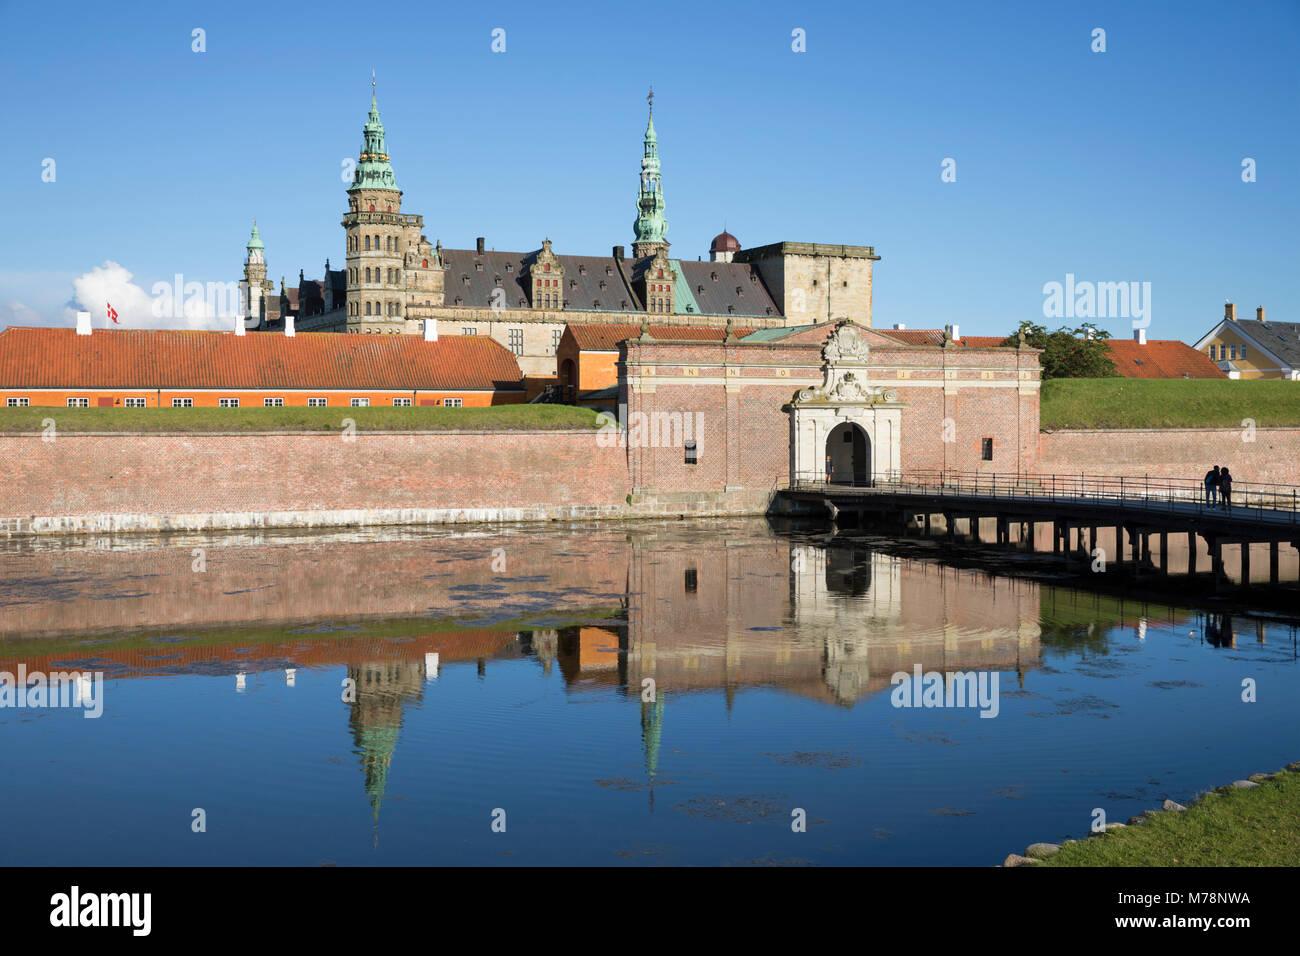 Blick über Graben, Eingang tor Schloss Kronborg als Einstellung für Shakespeares Hamlet, Helsingor, Neuseeland, Stockbild